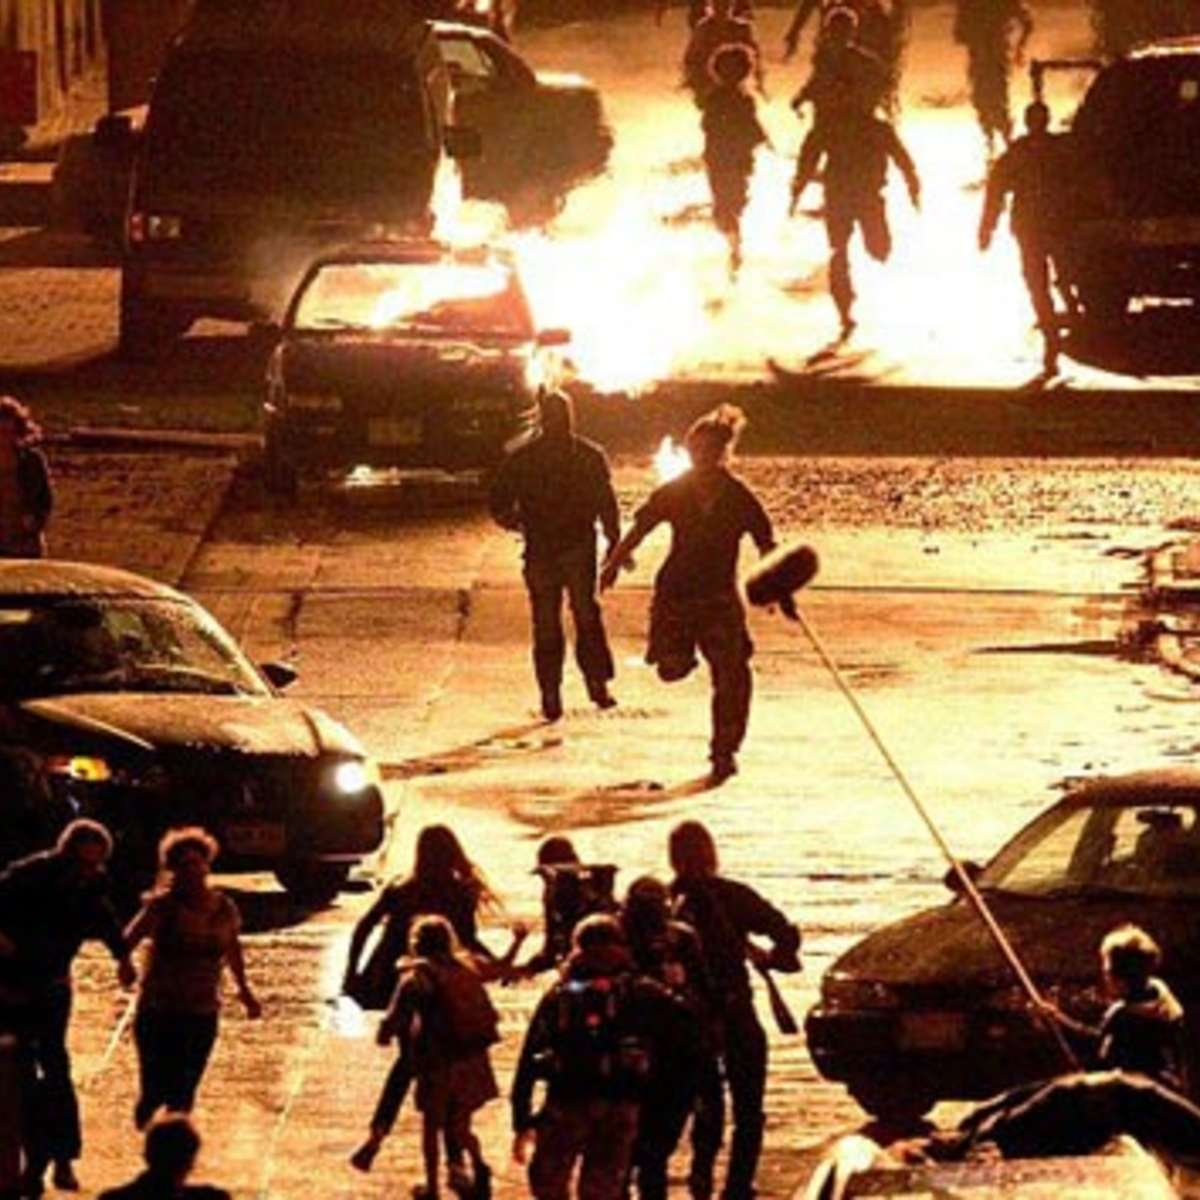 world-war-z-set-pic-night1_0.jpg